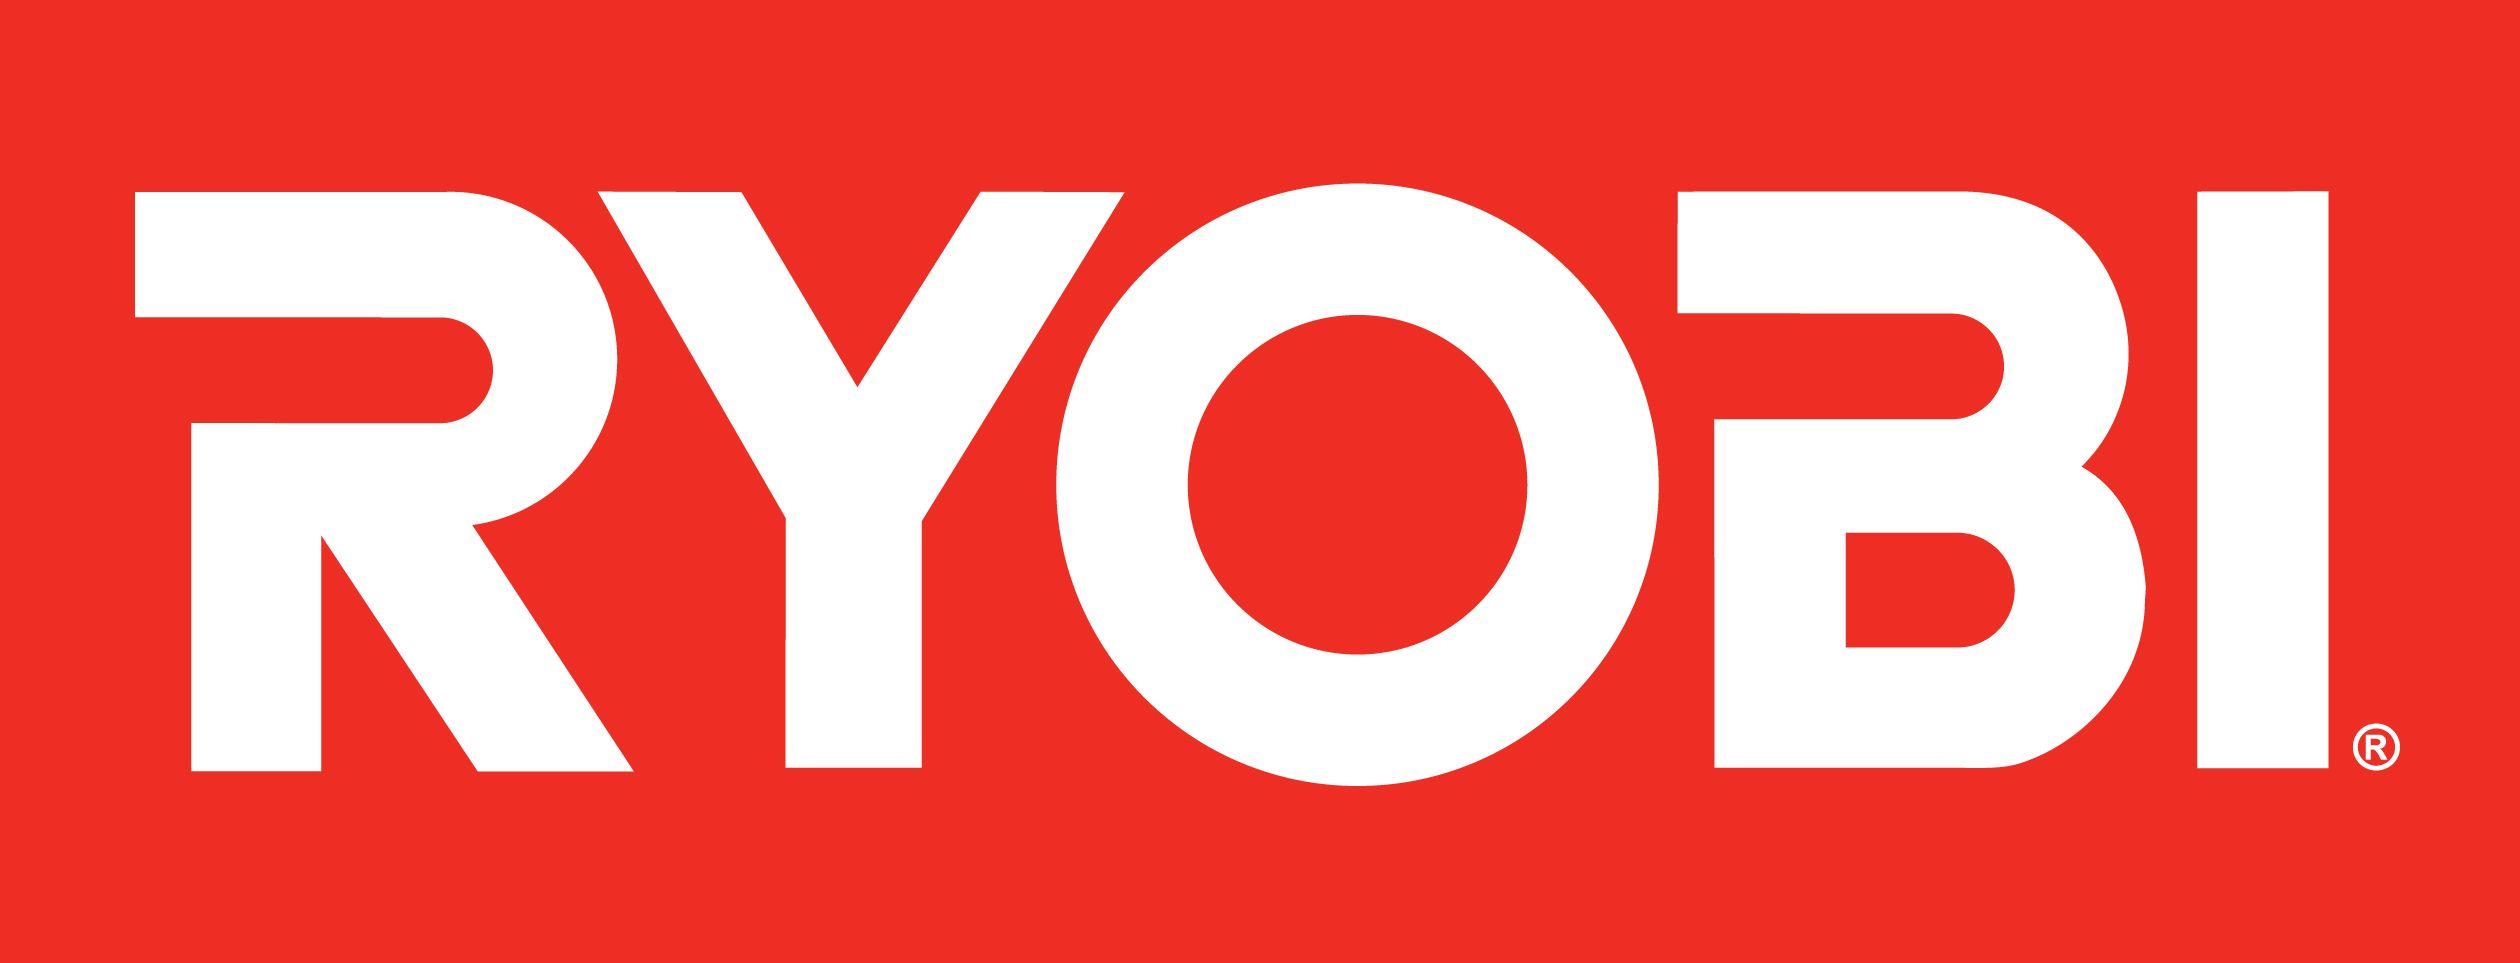 Comment contacter Ryobi Motoculture ?